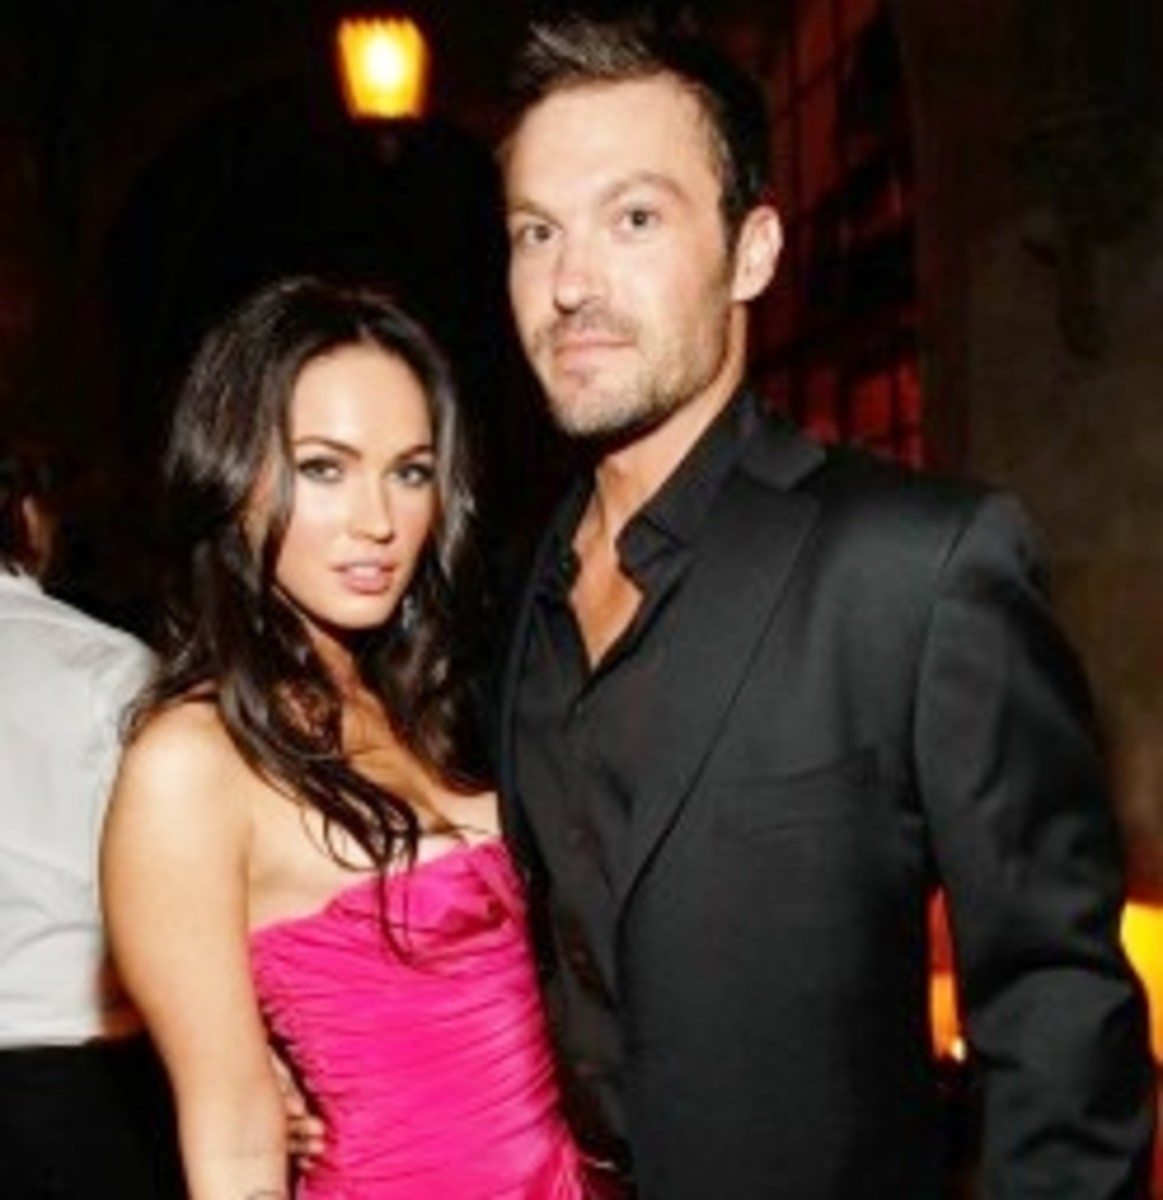 Actress Megan Fox (30) and husband Brian Austin Green (43)